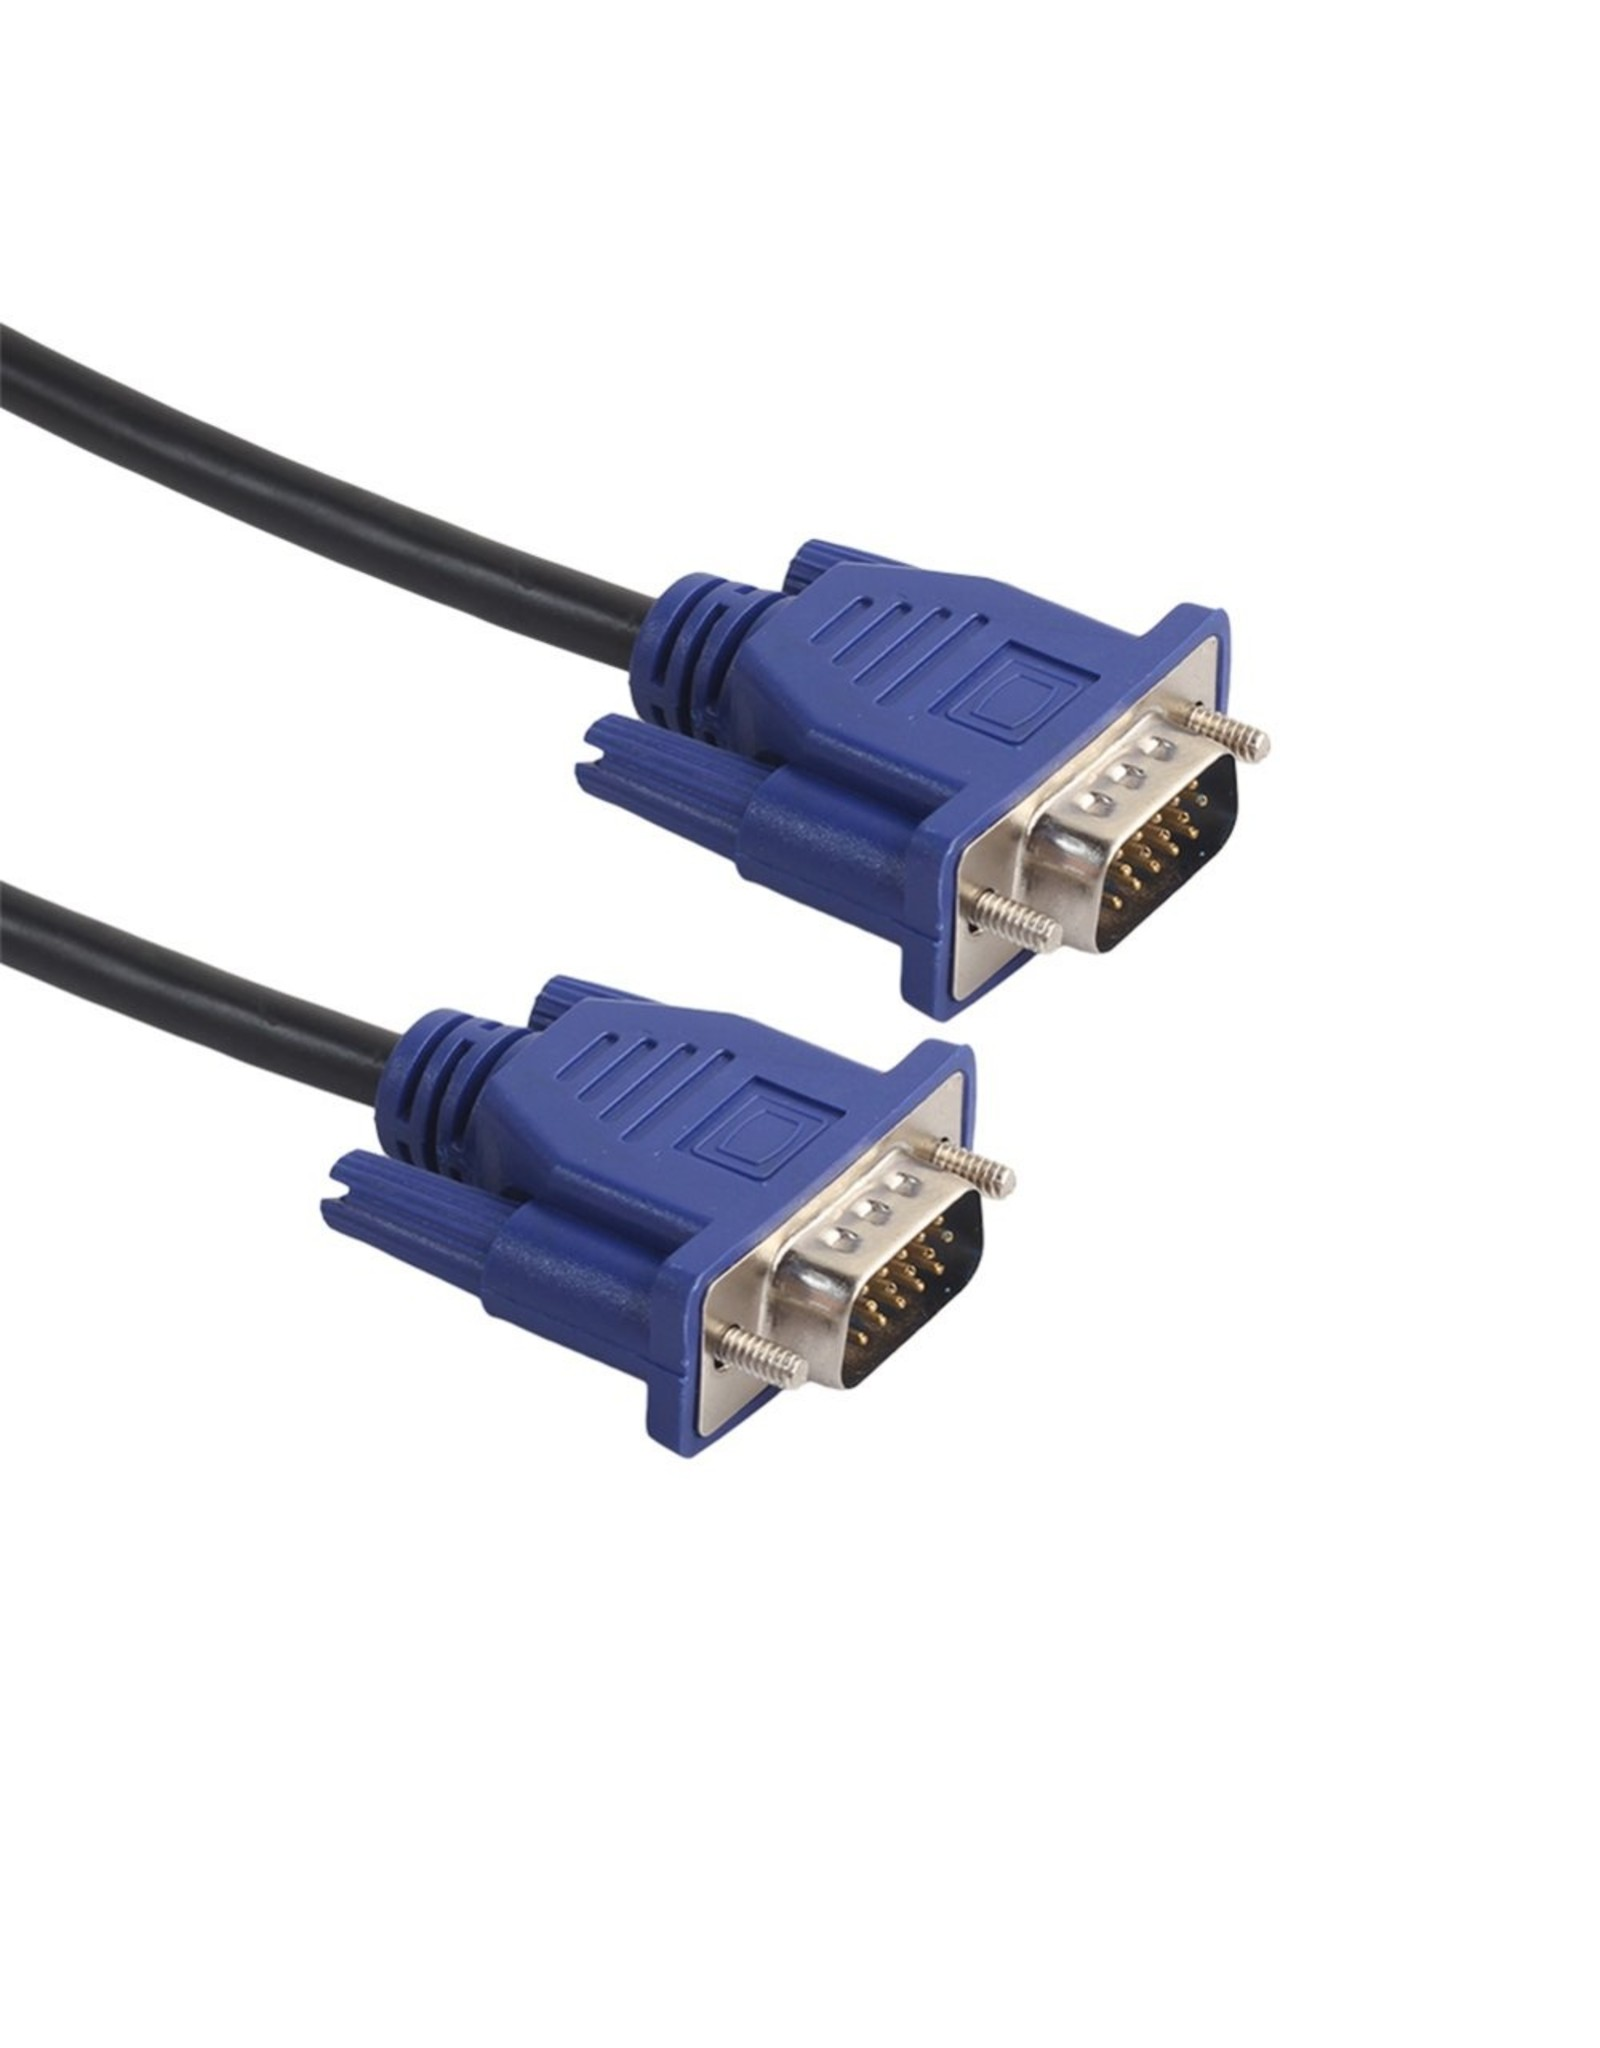 Ewent OEM VGA Monitor Cable 5.0 Meter